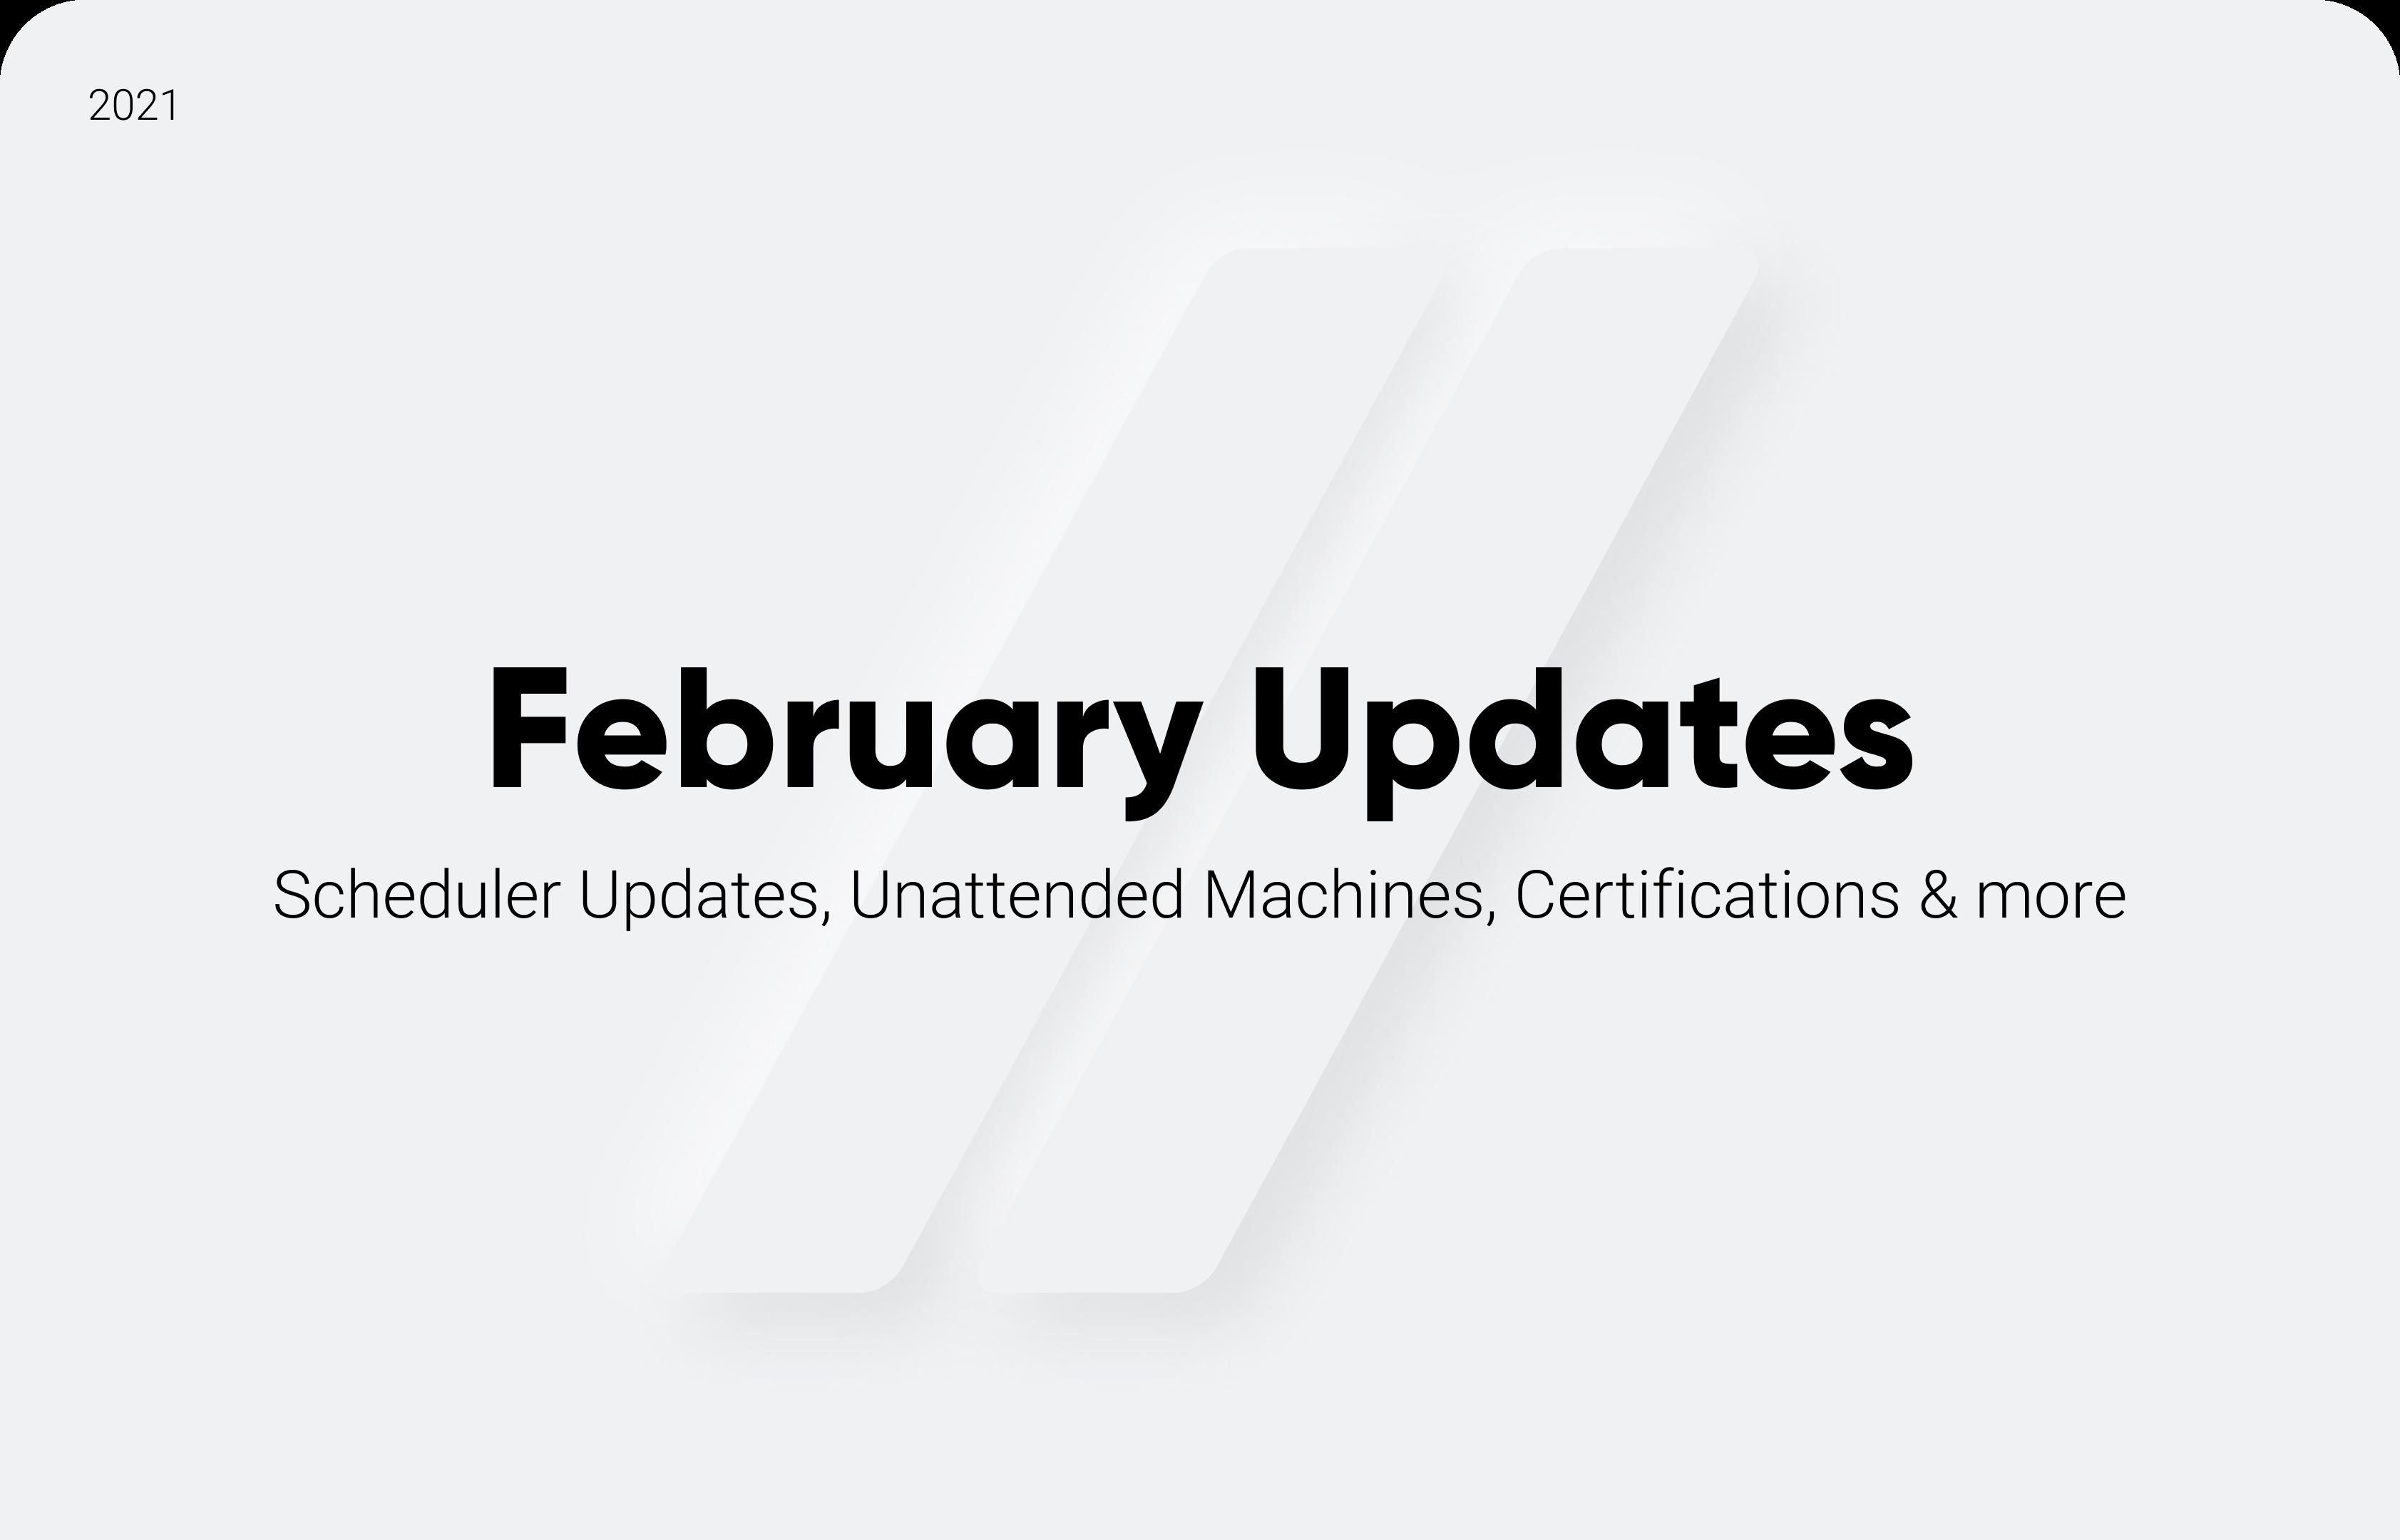 February Updates: Scheduler Updates, Unattended Machines, Certifications & more